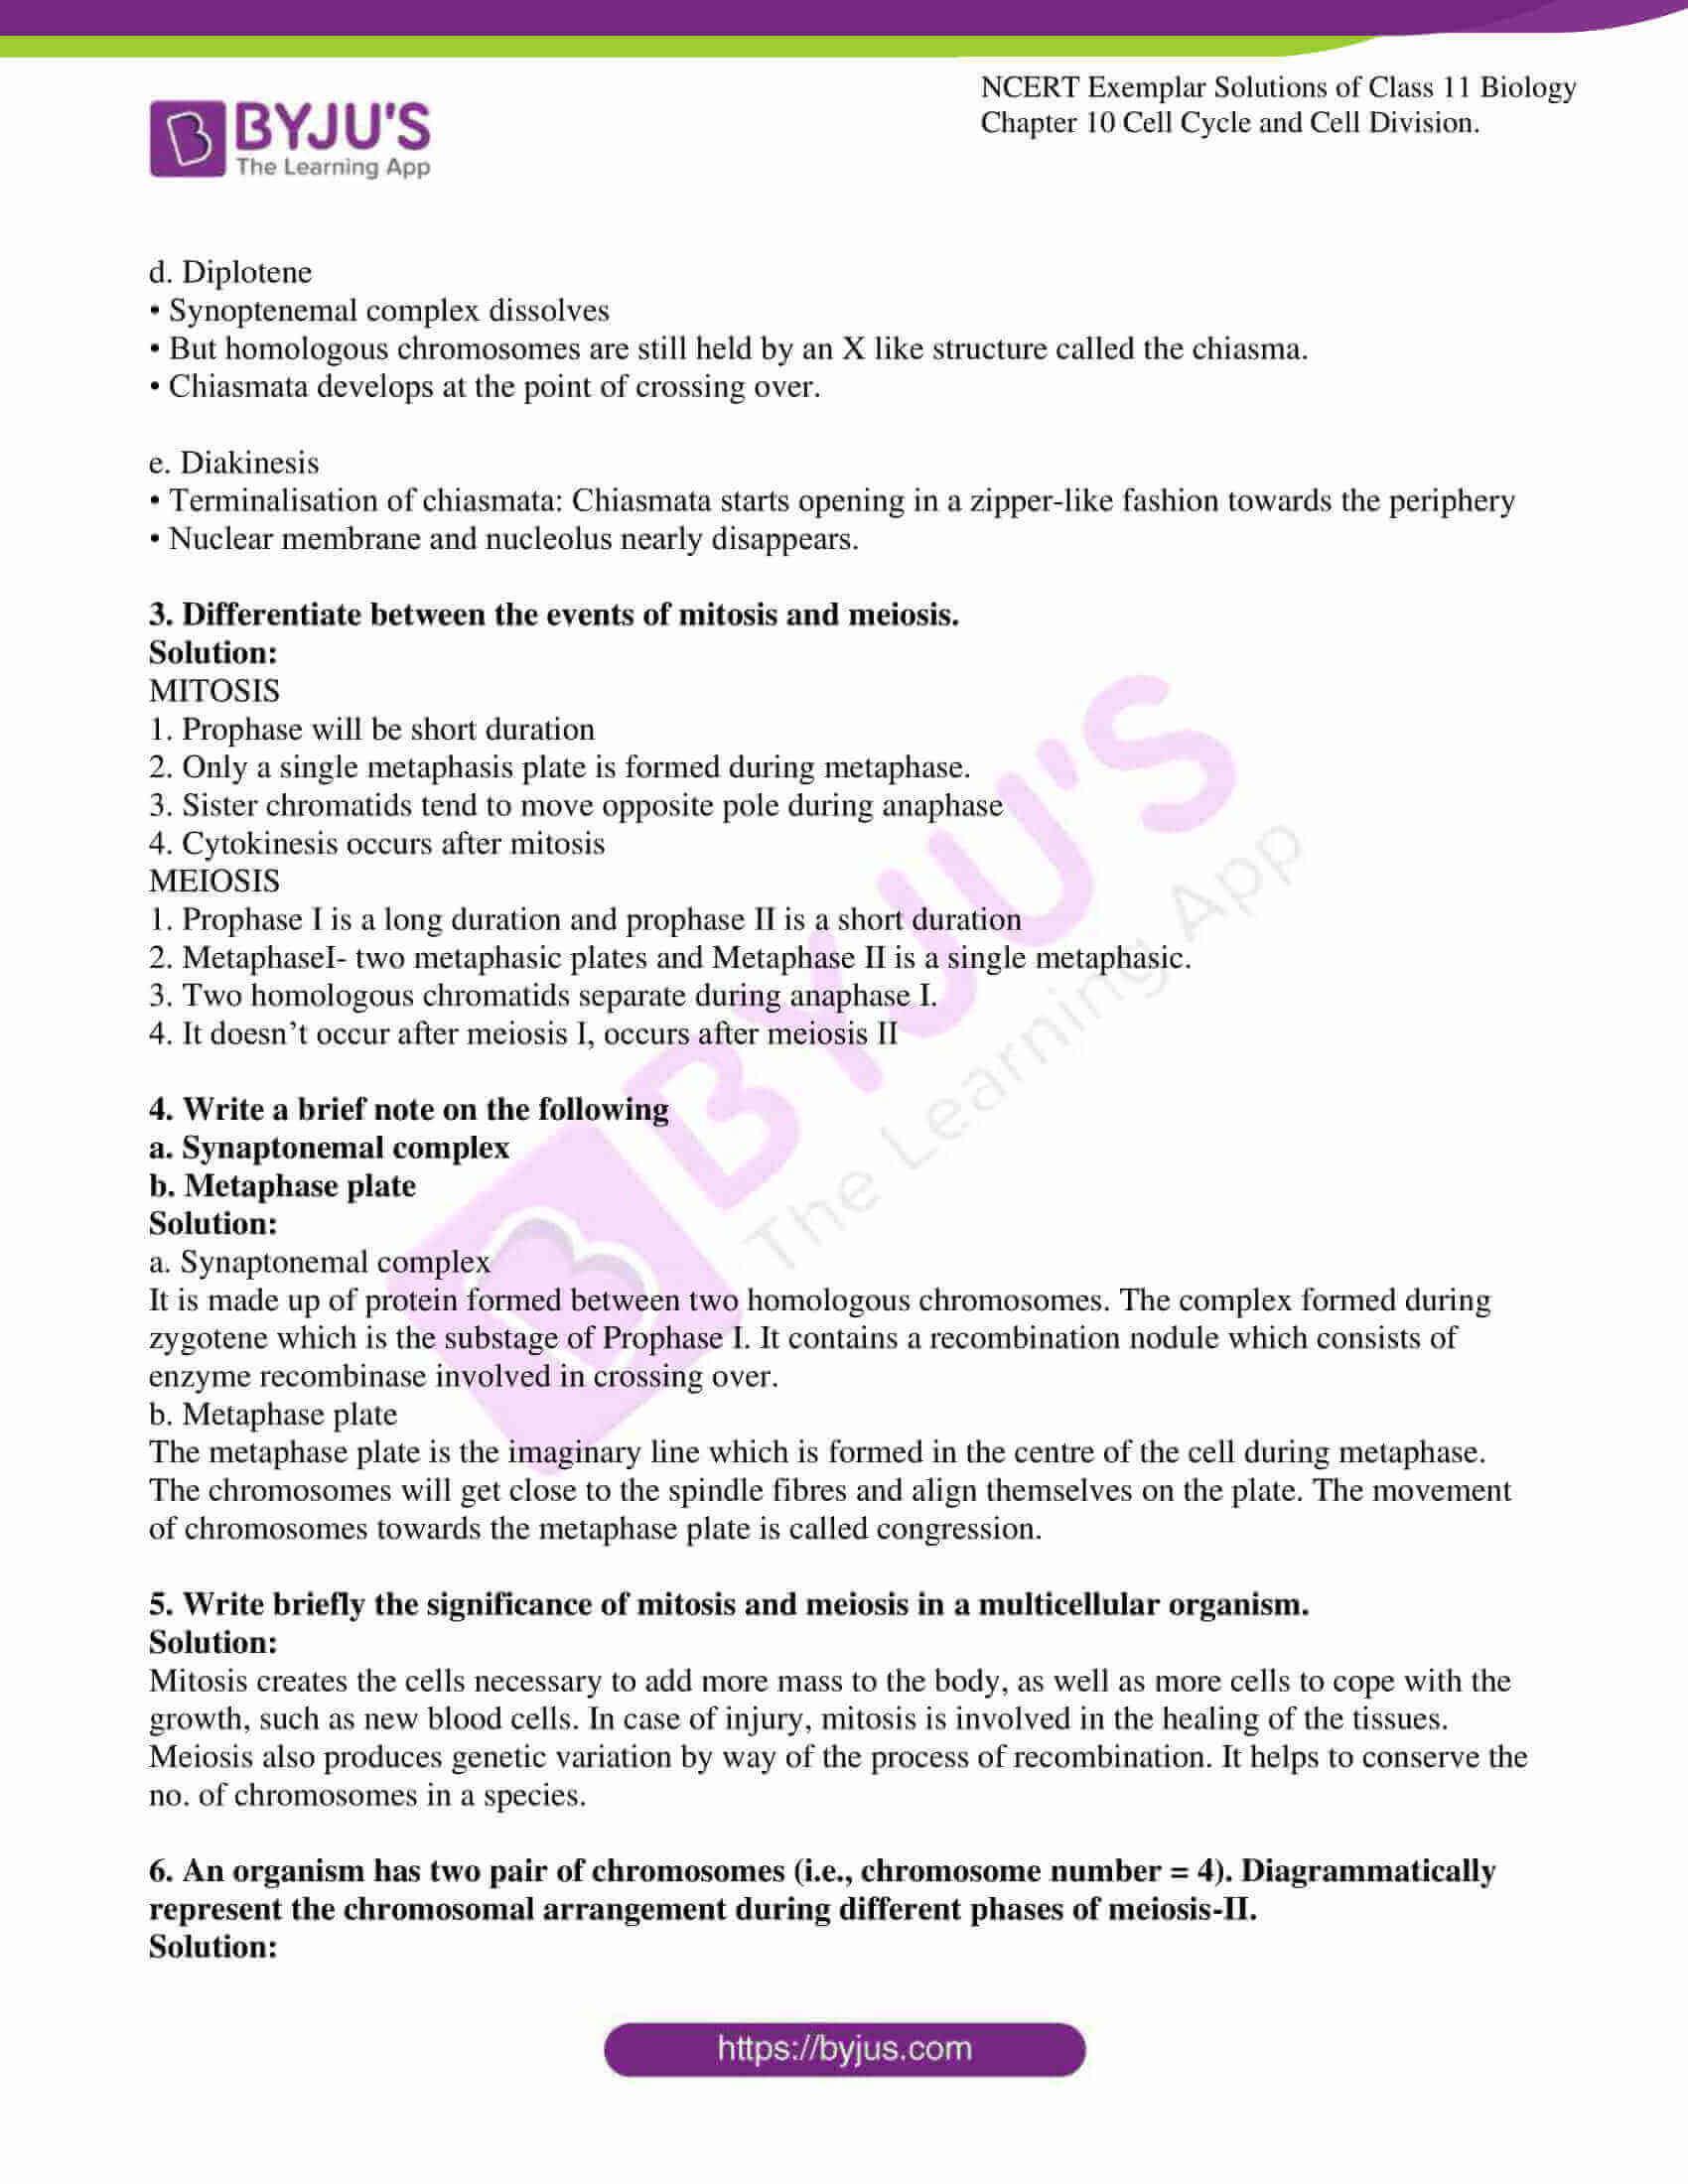 ncert exemplar solutions for class 11 bio chapter 10 8